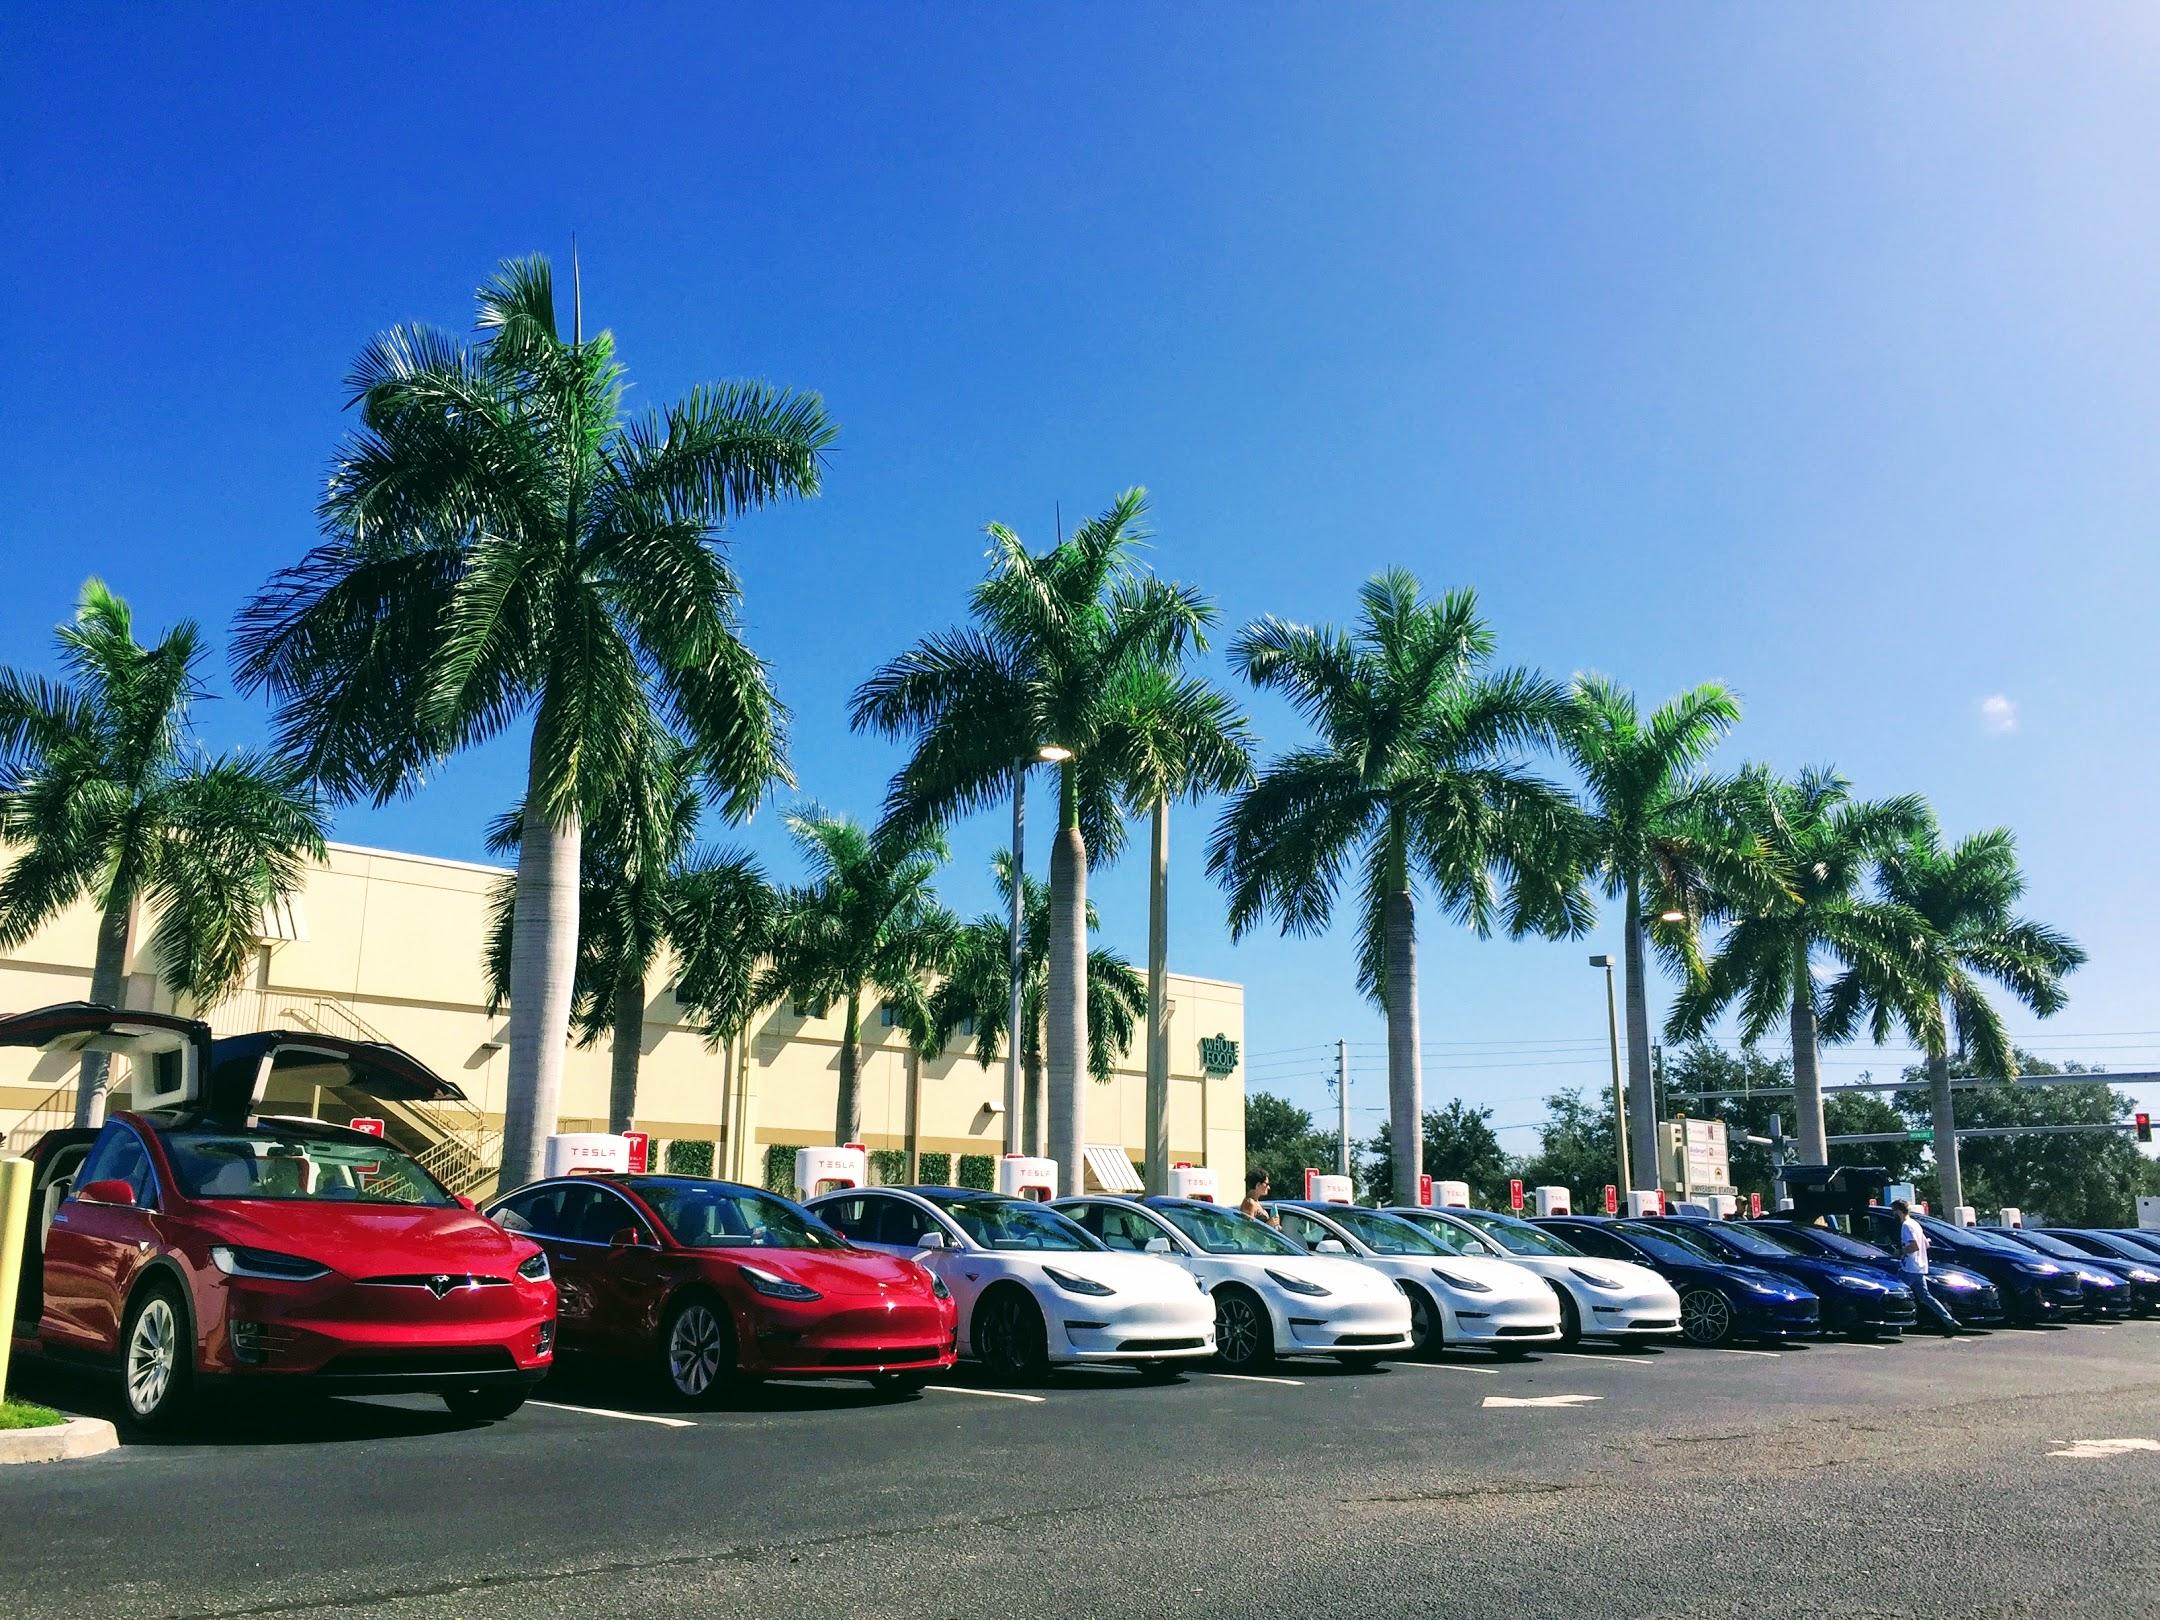 Tesla Model 3, S, X fleet